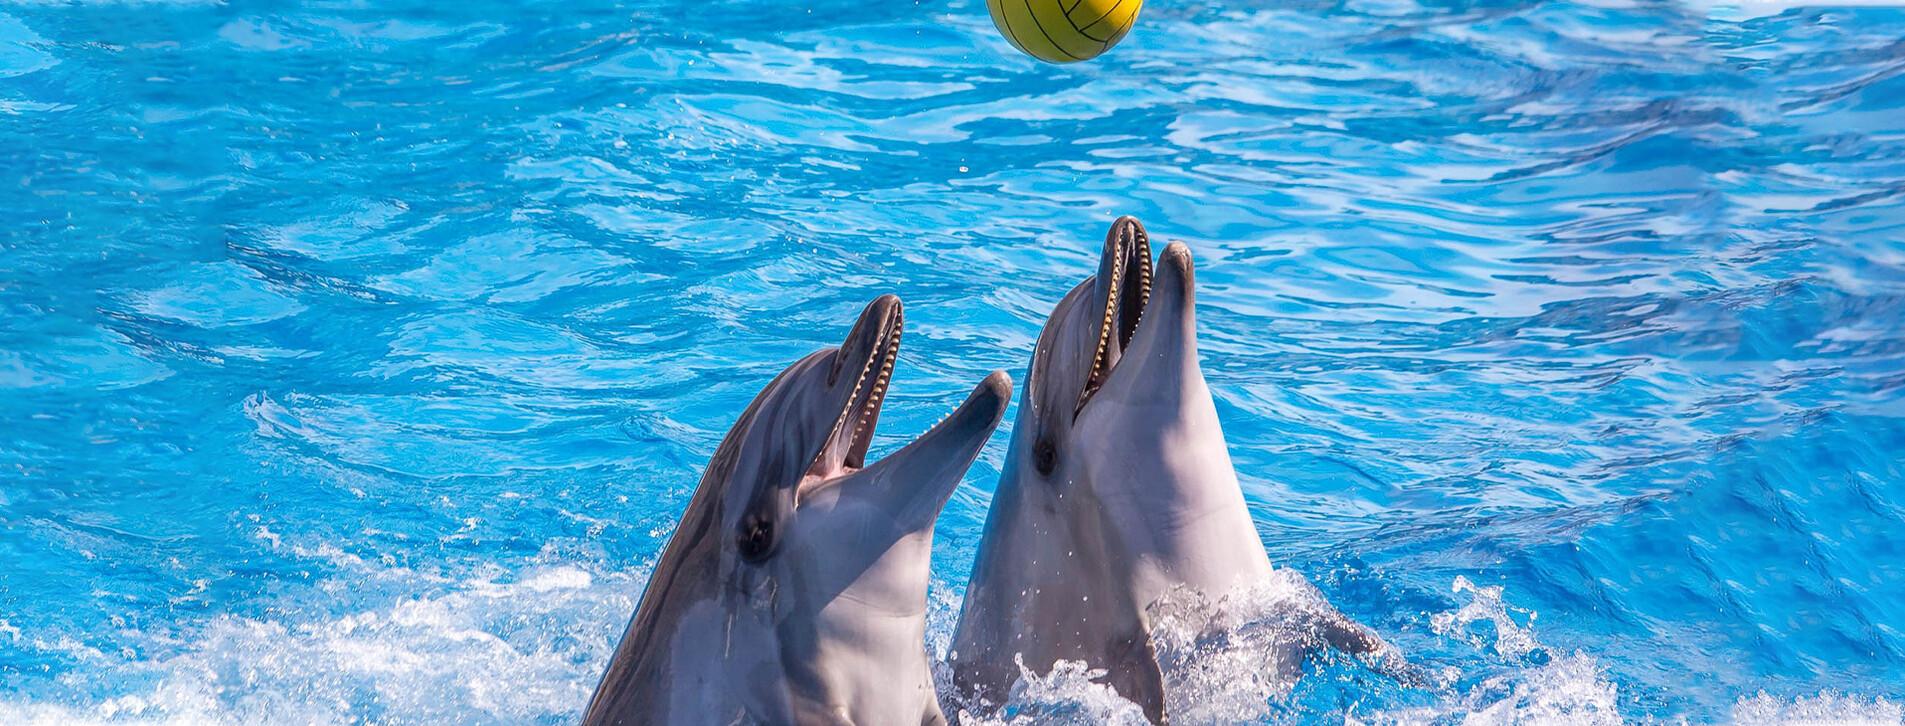 Fotoğraf - Dolphinarium Gösterisi